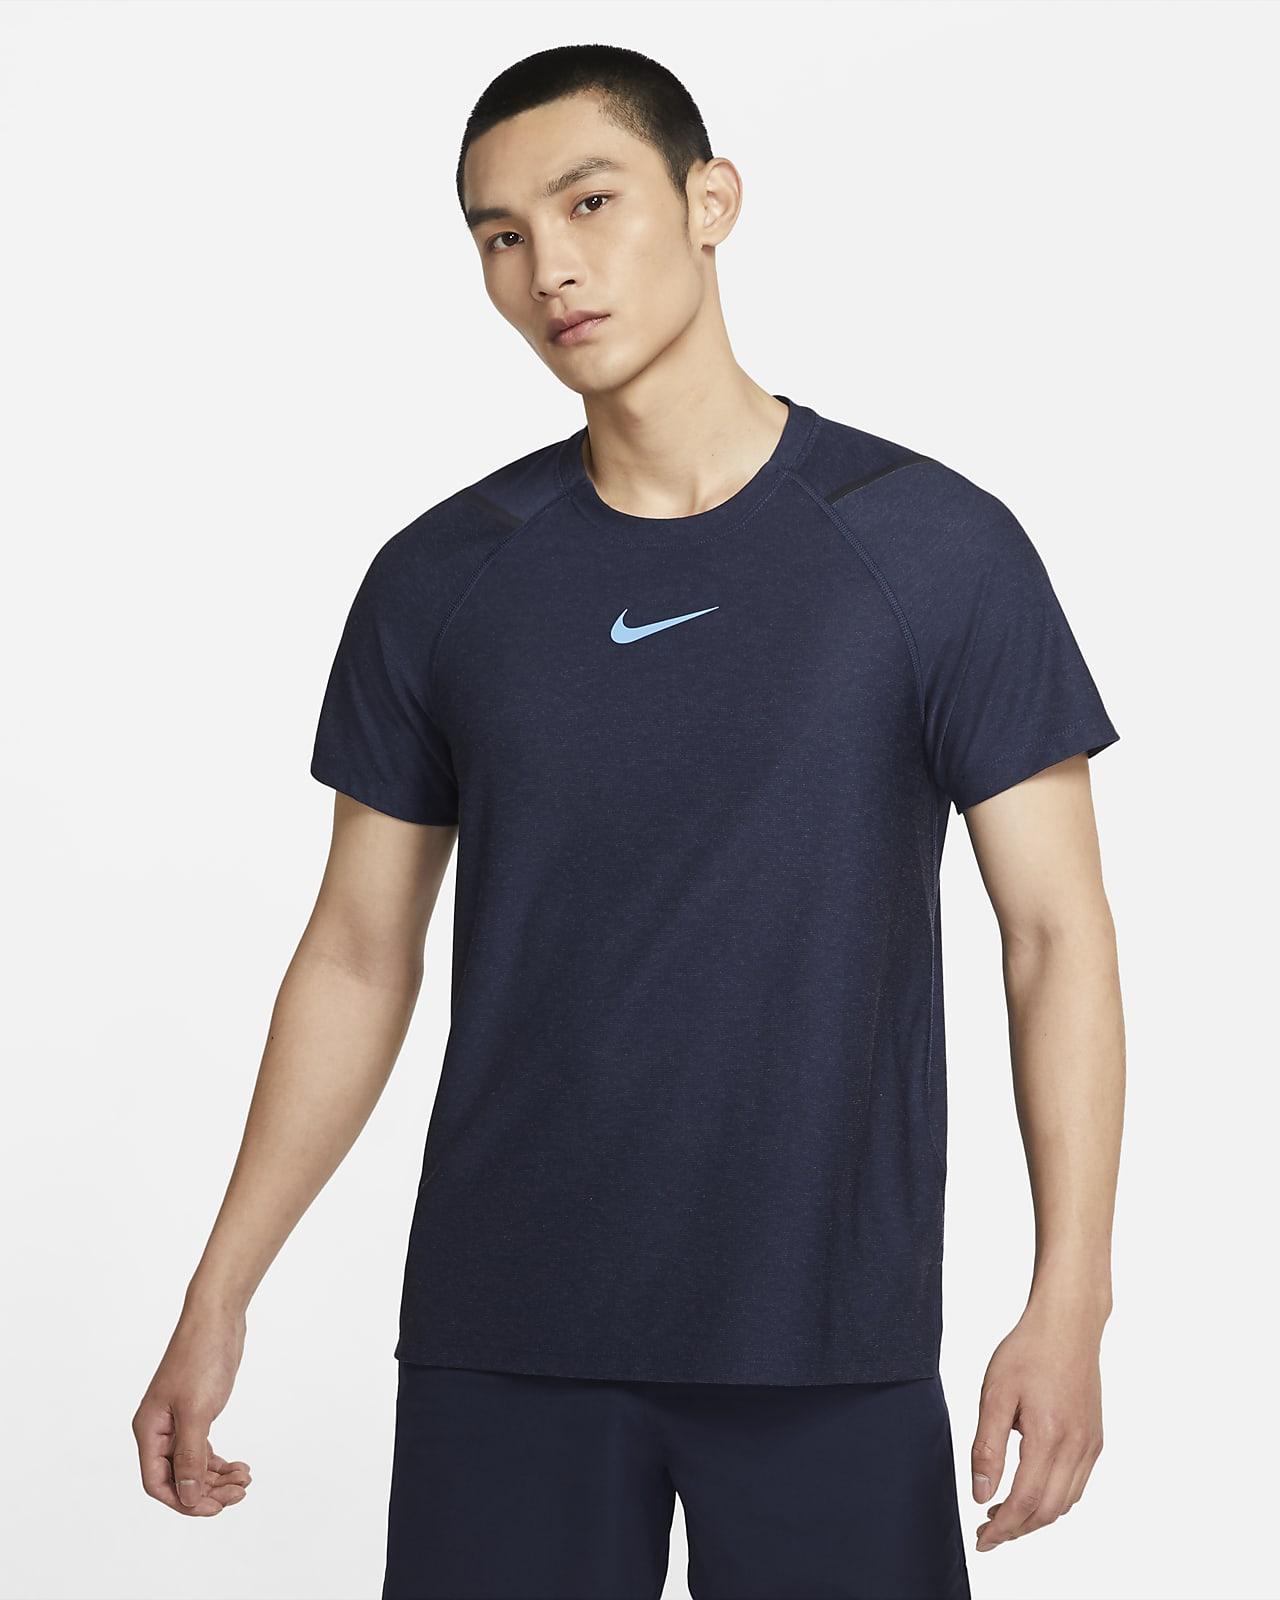 Nike Pro 男子短袖训练上衣